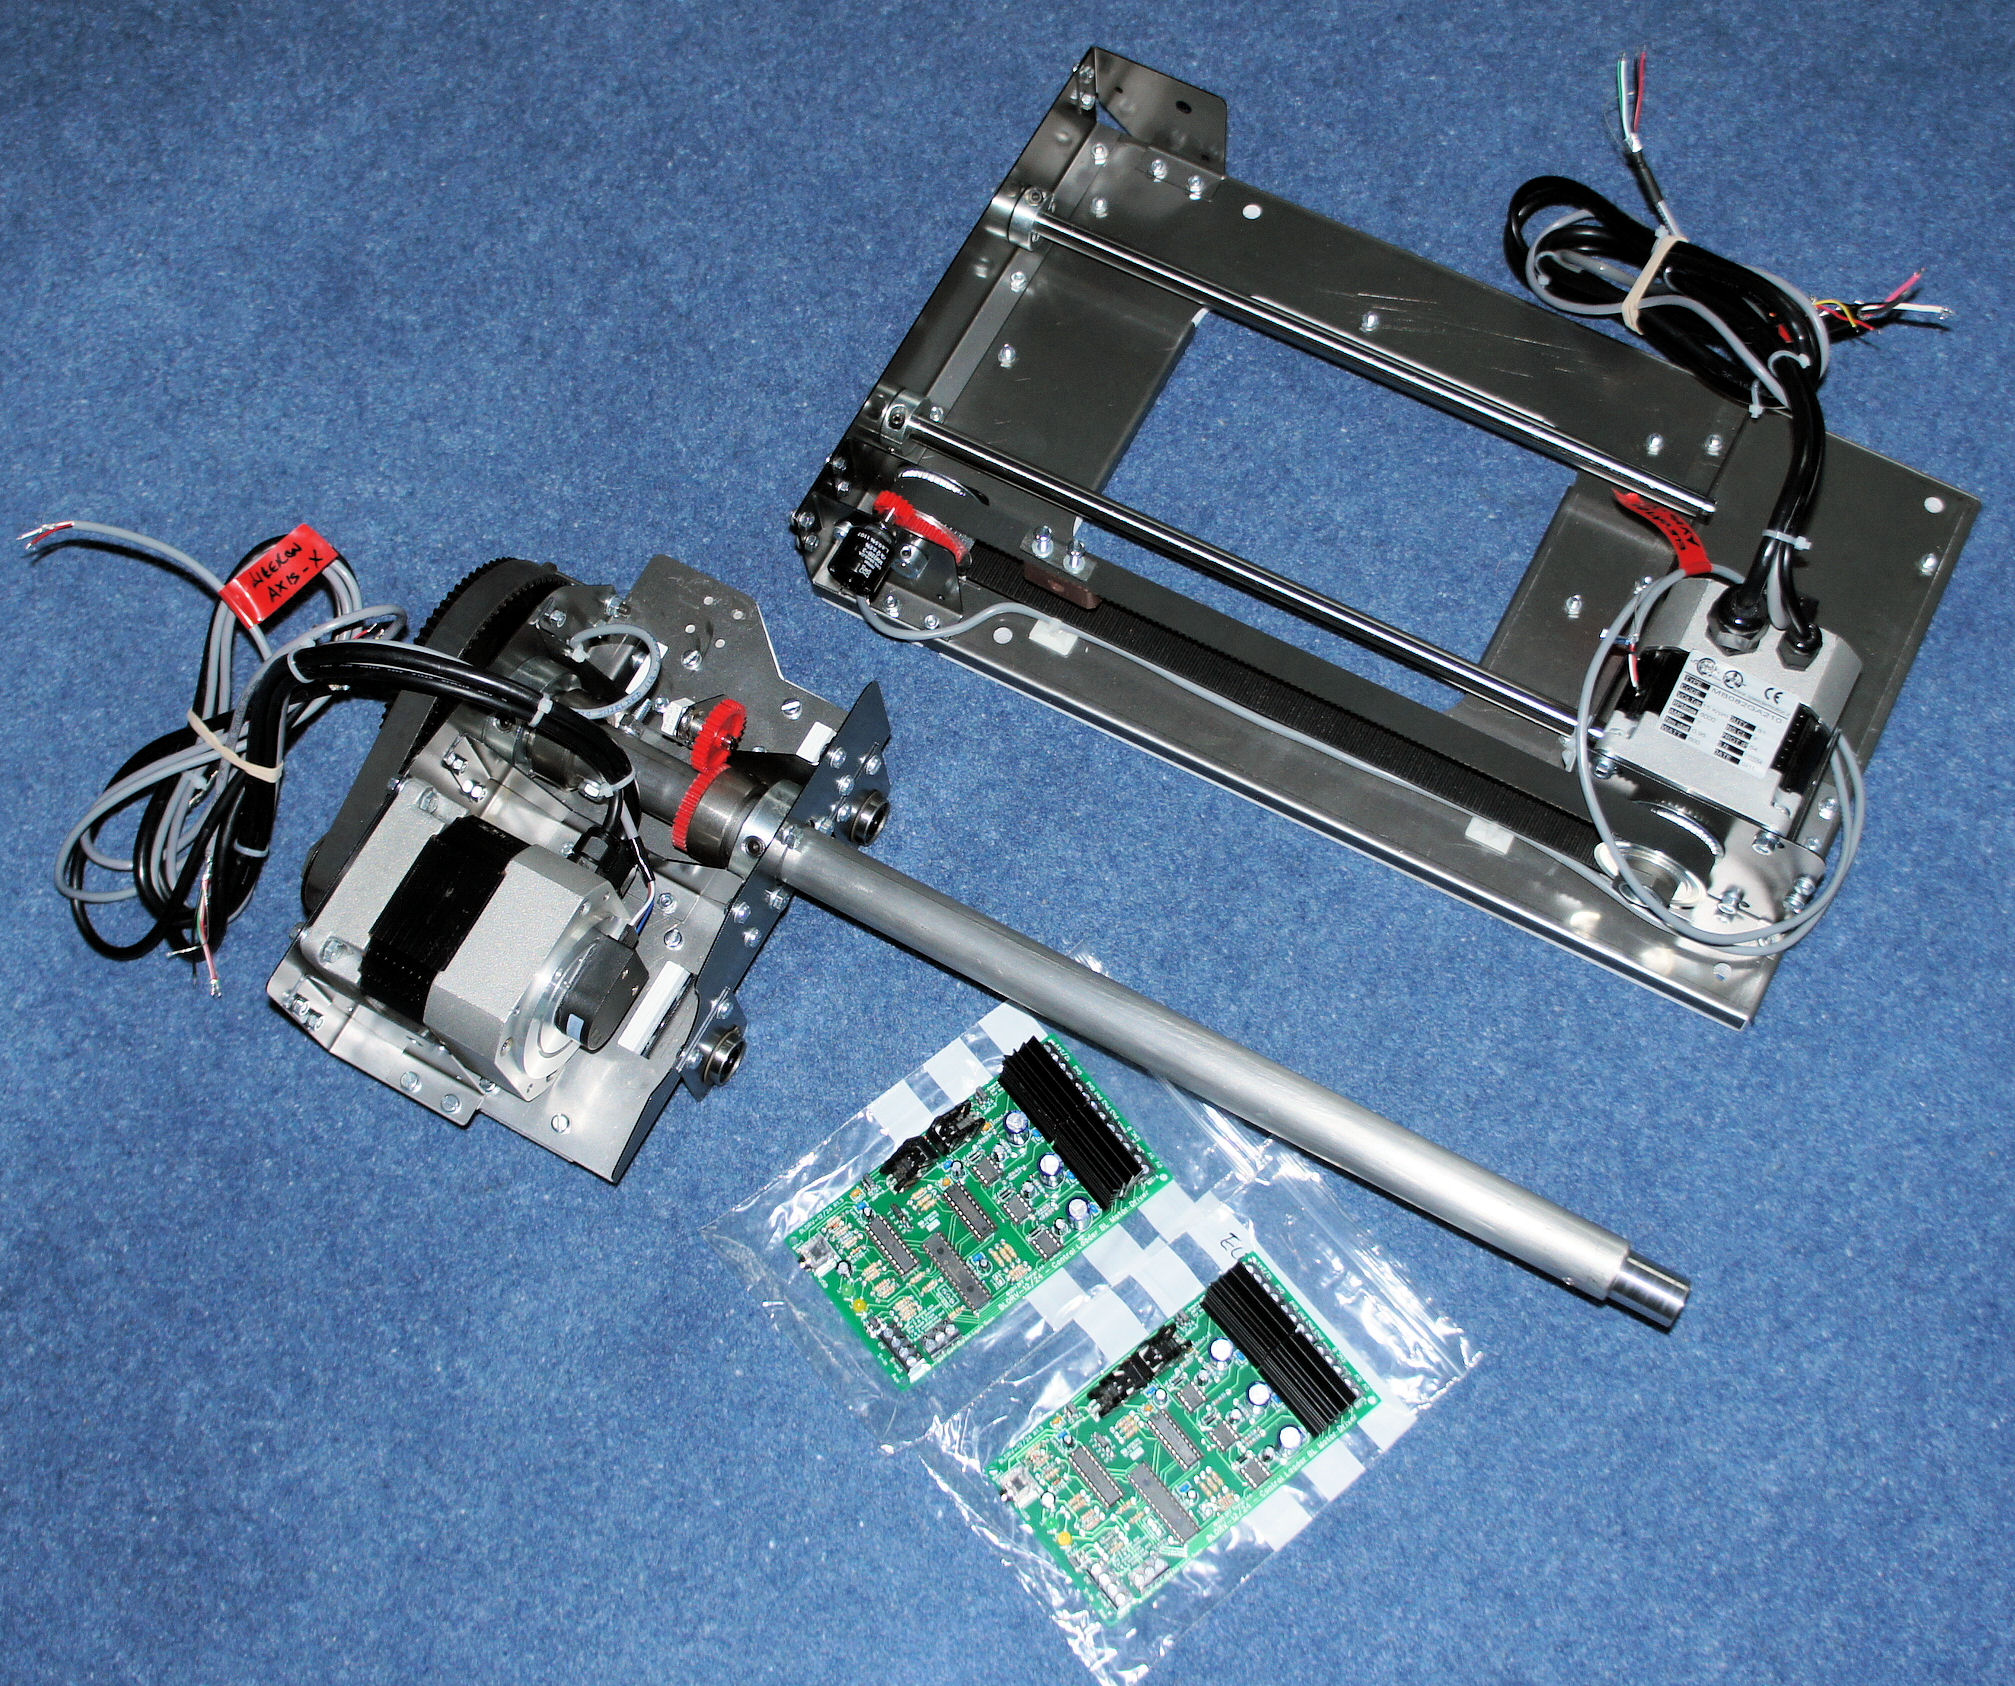 http://www.bffsimulation.com/FFB-Yoke-3/BFF-DIY-Kit-7.jpg